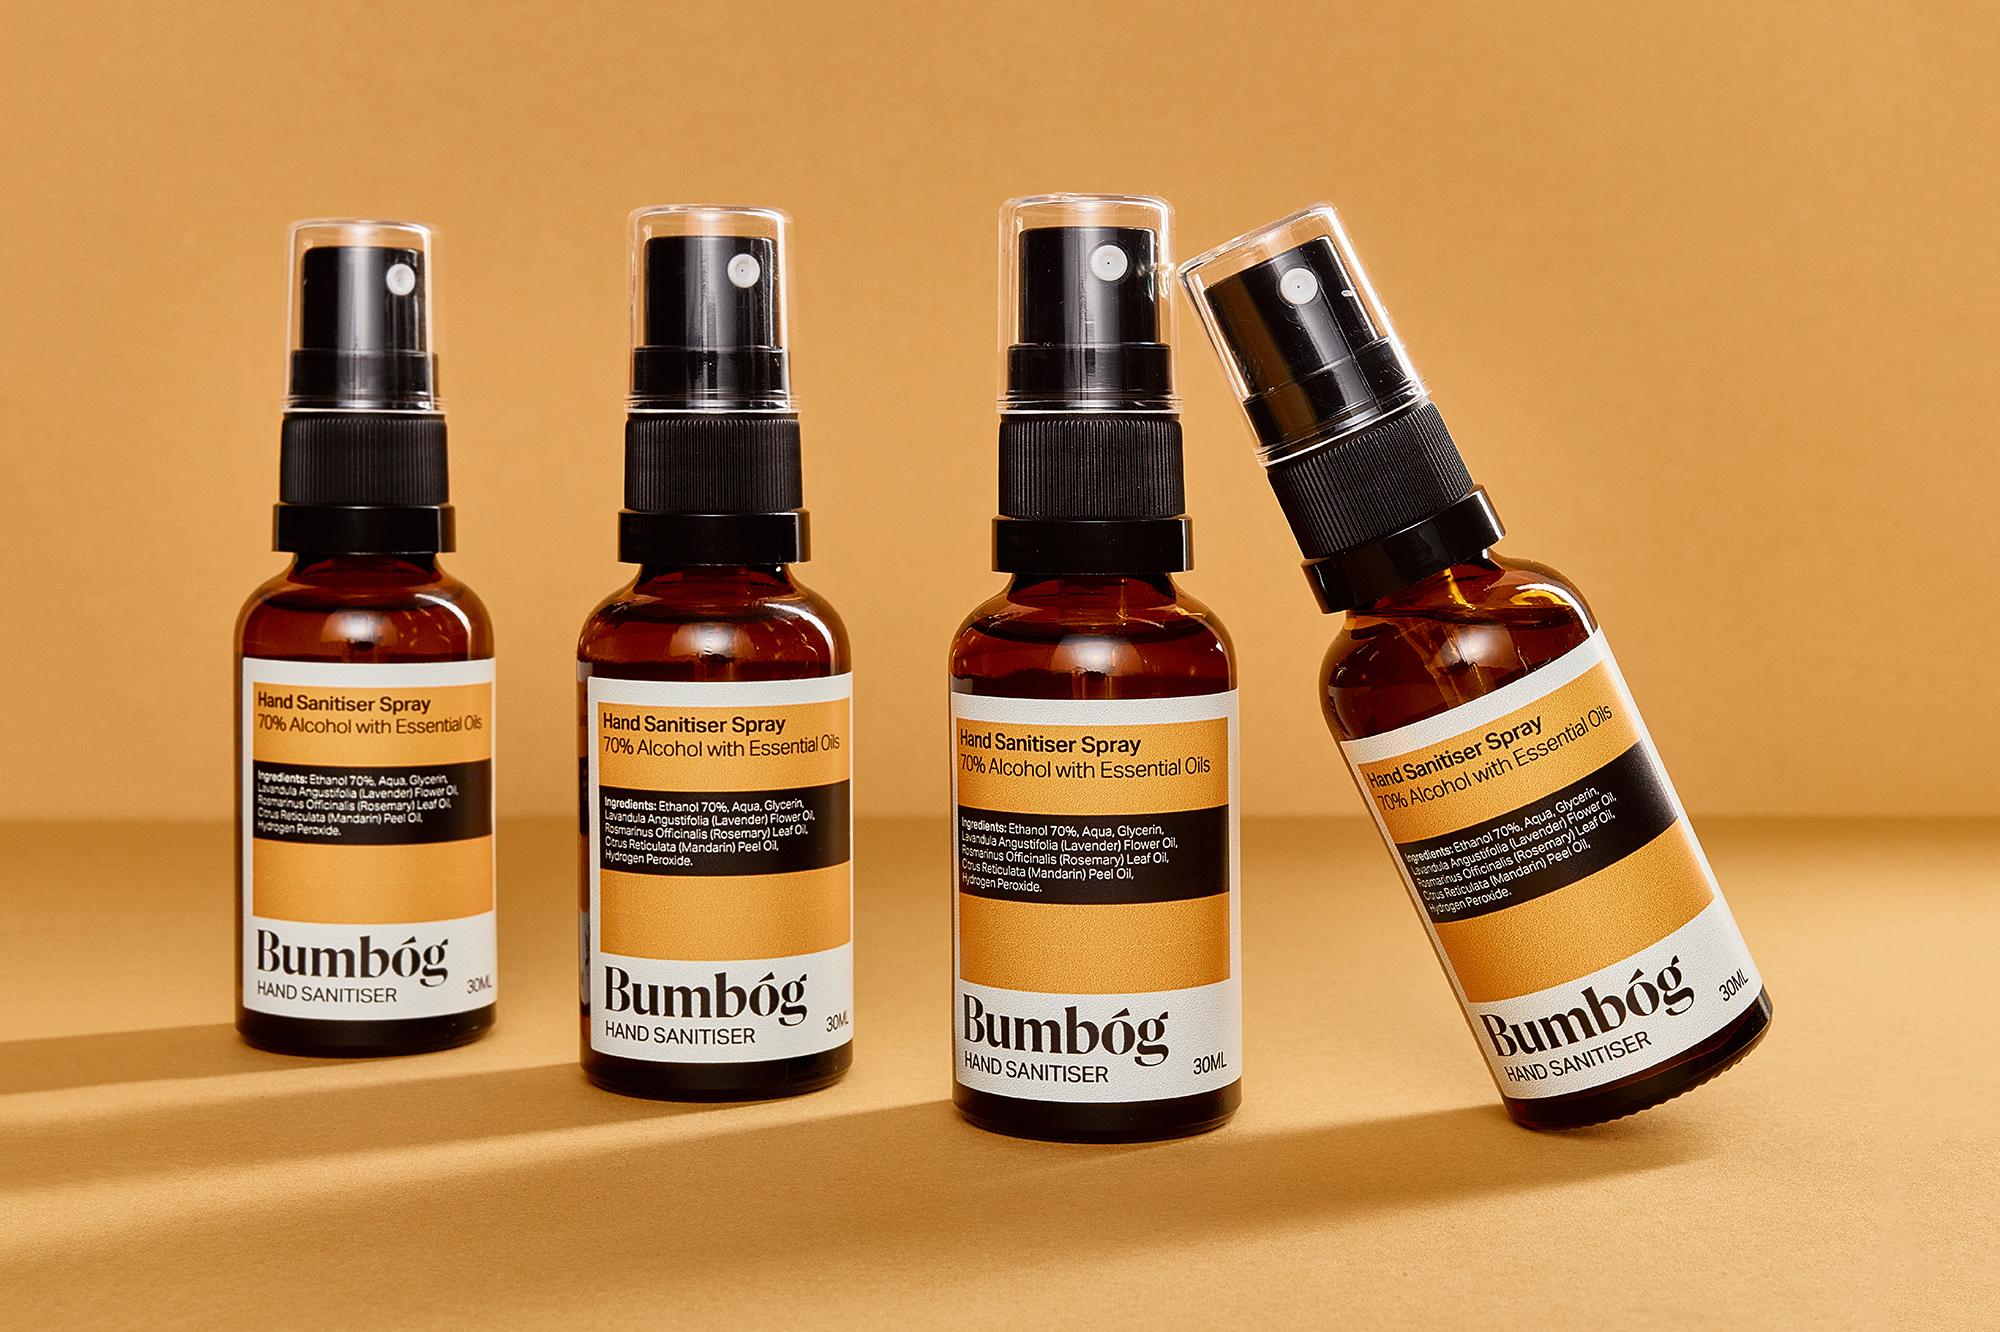 Cover image: Bumbóg